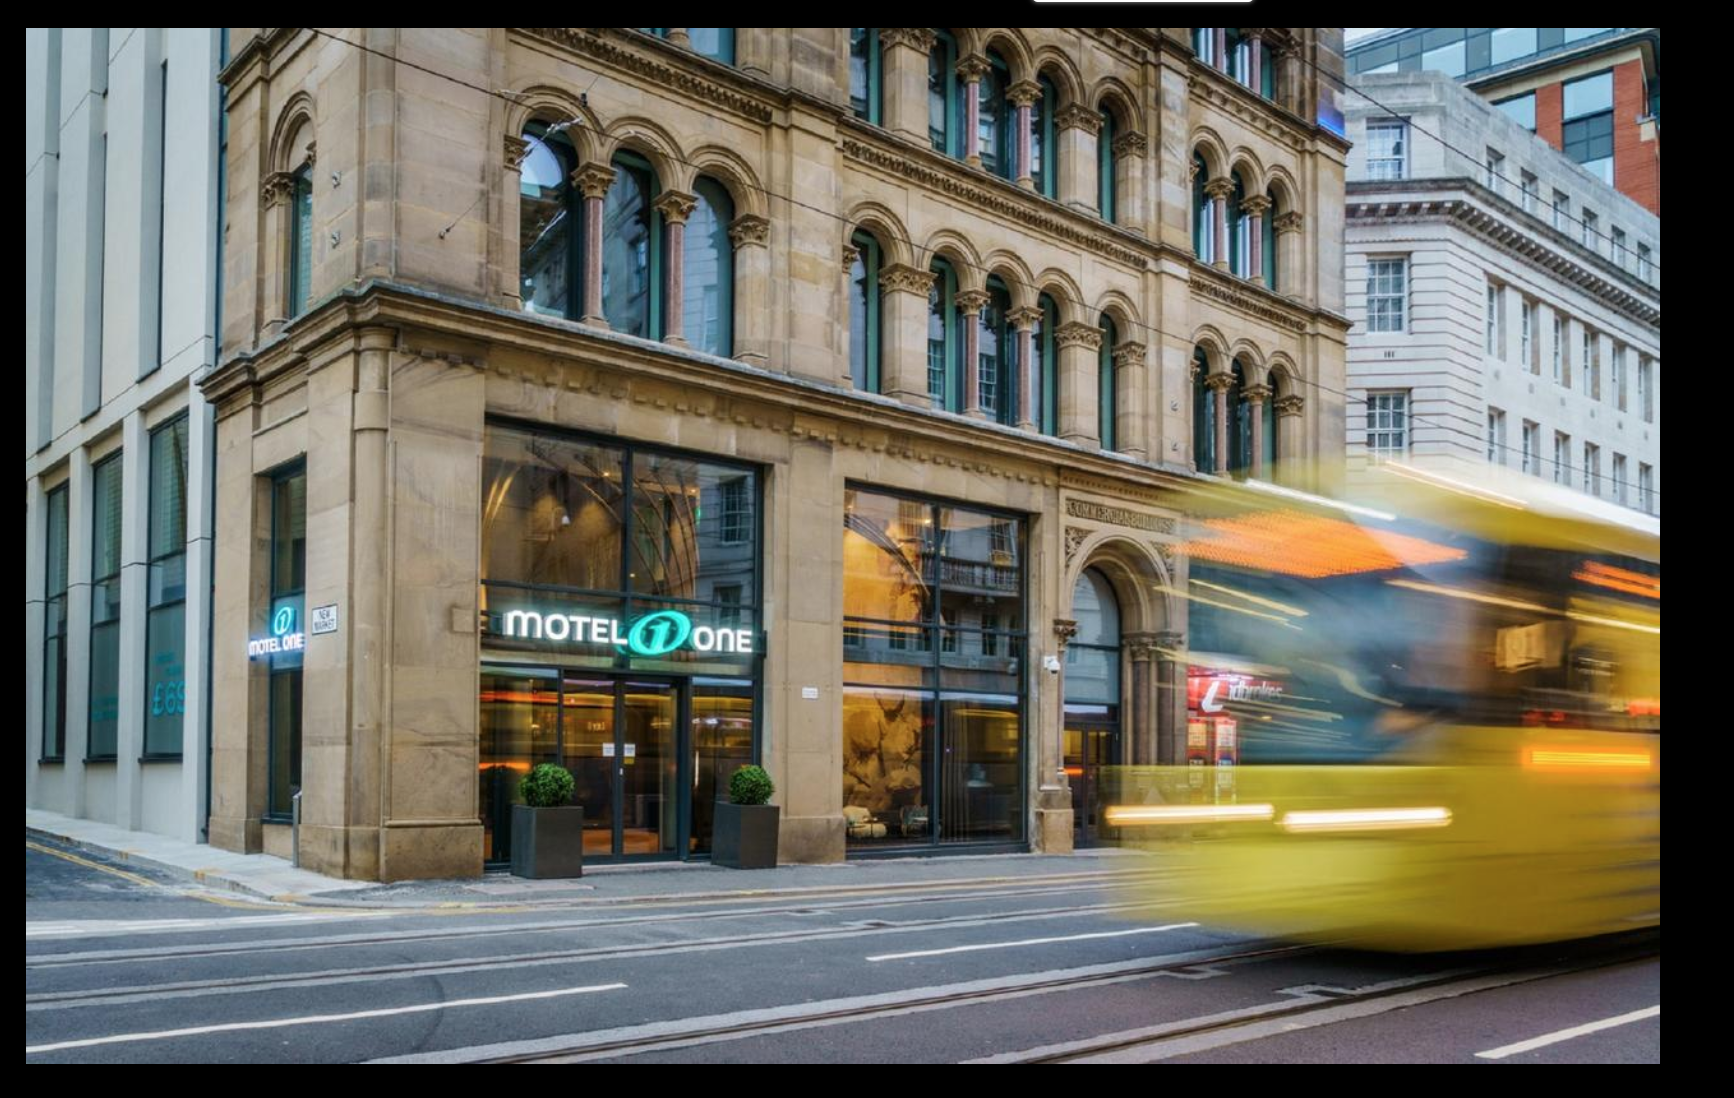 Midrange Hotel in Manchester